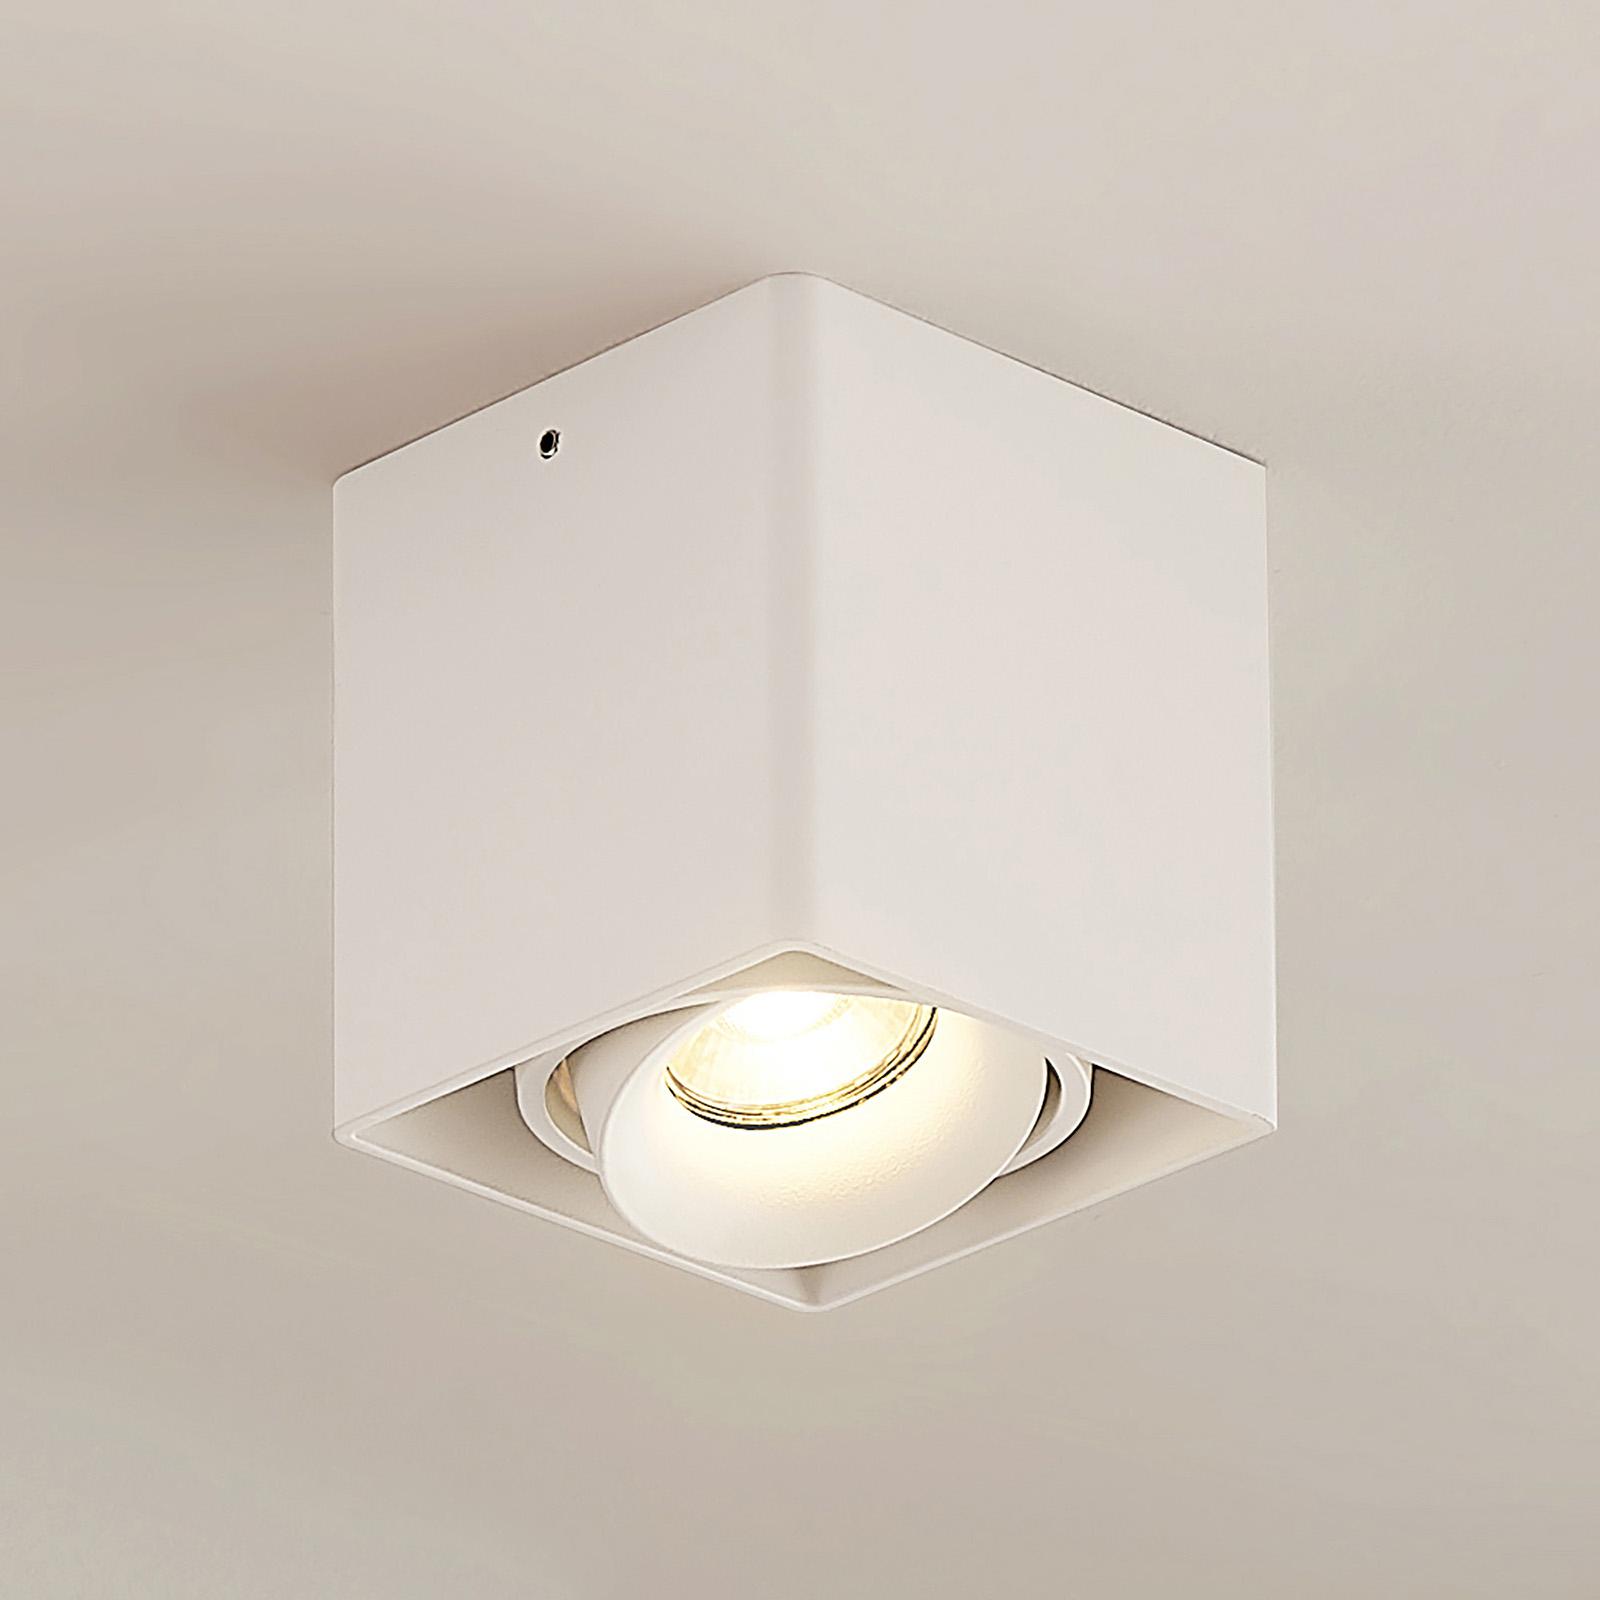 Arcchio Kubika downlight, GU10, 1 lyskilde, hvit